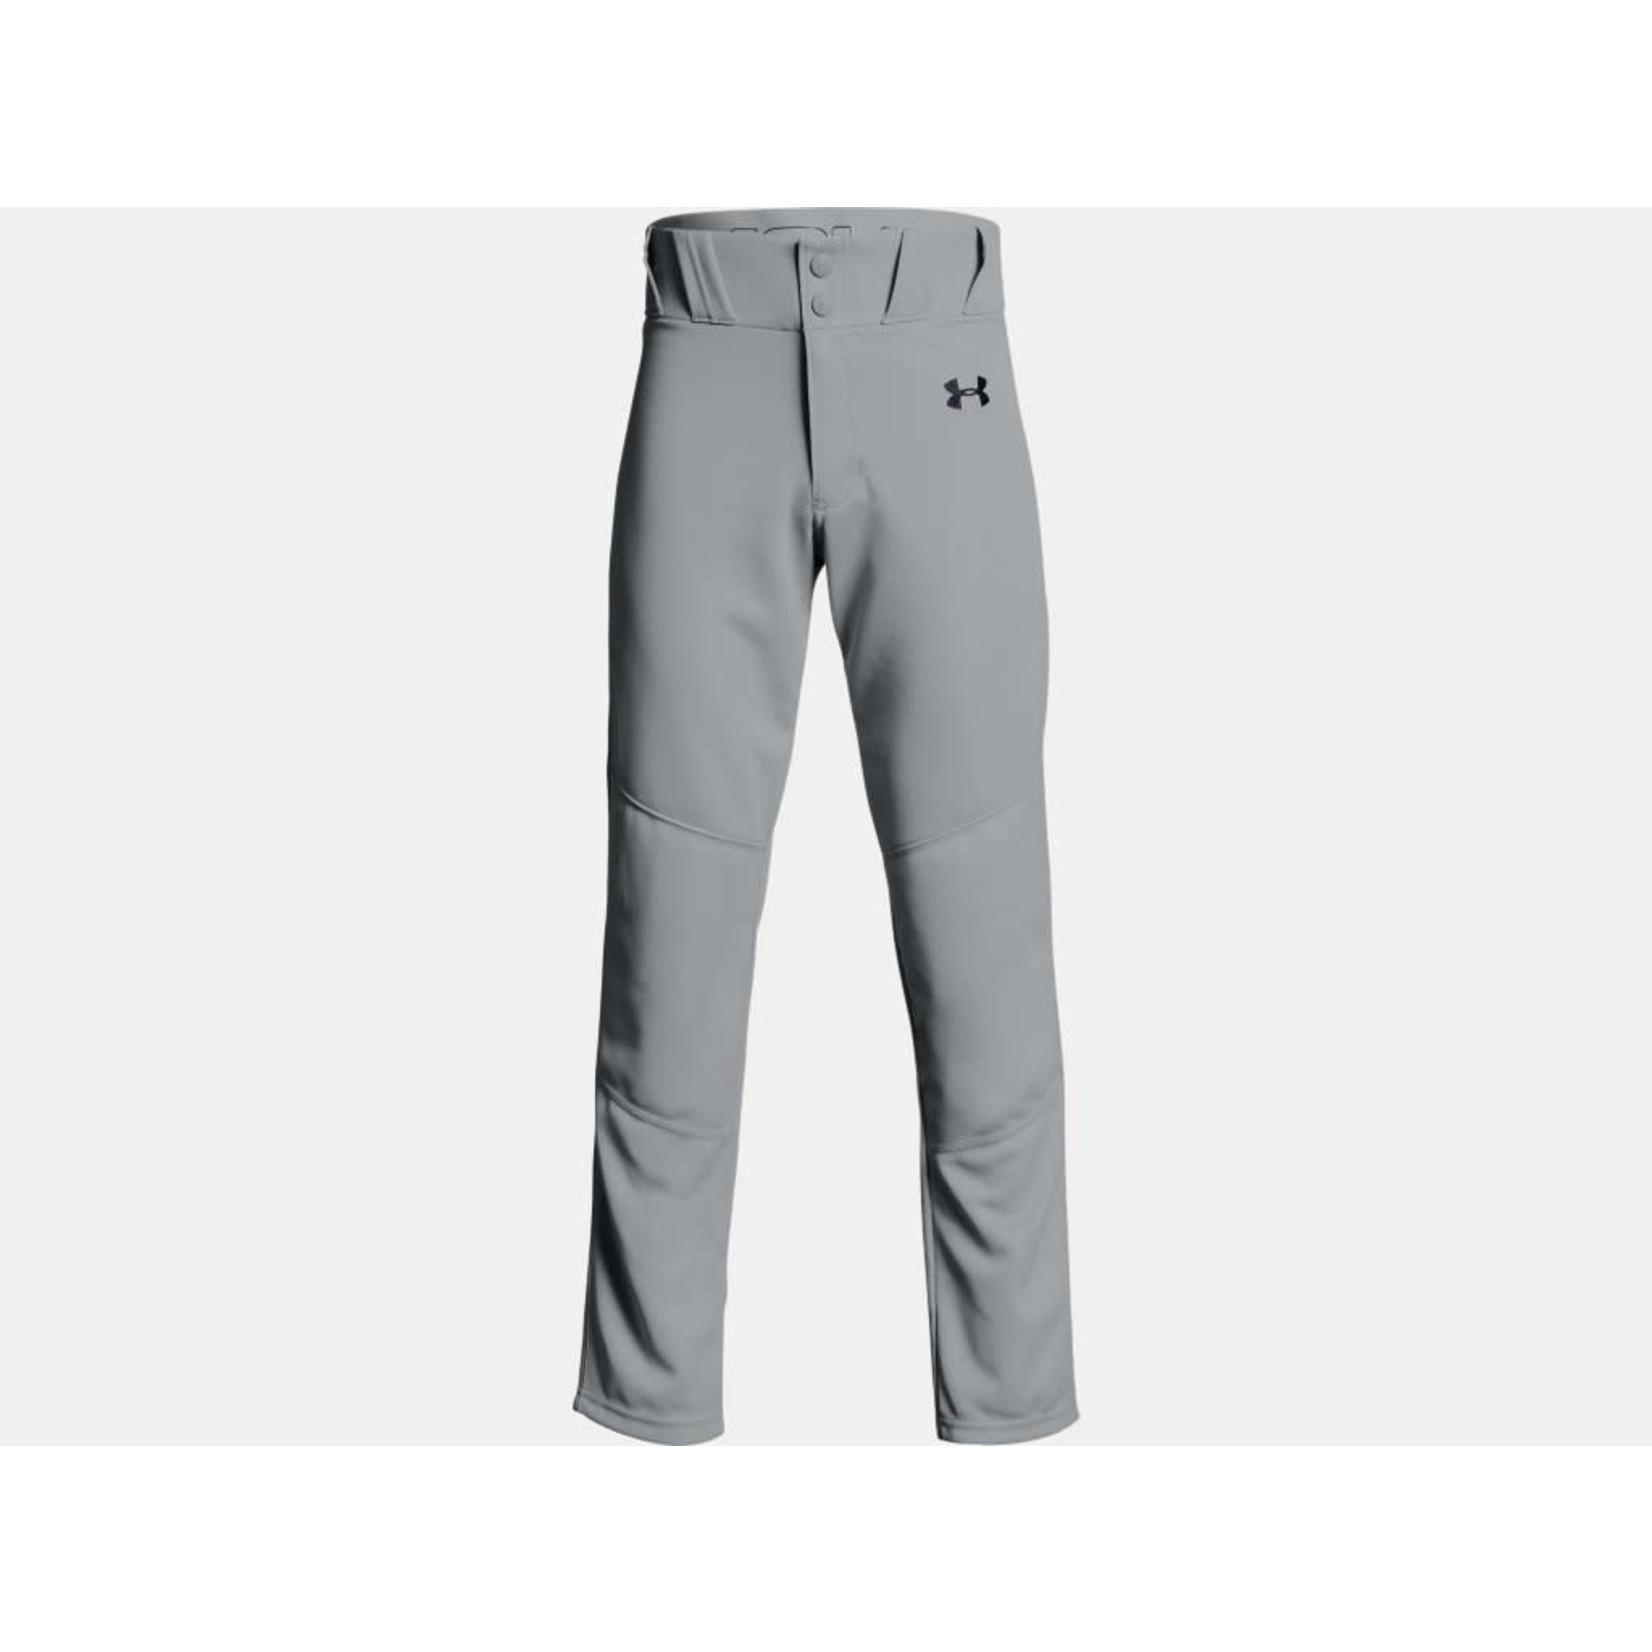 Under Armour Under Armour Baseball Pants, Utility Relaxed Open Bottom, Boys